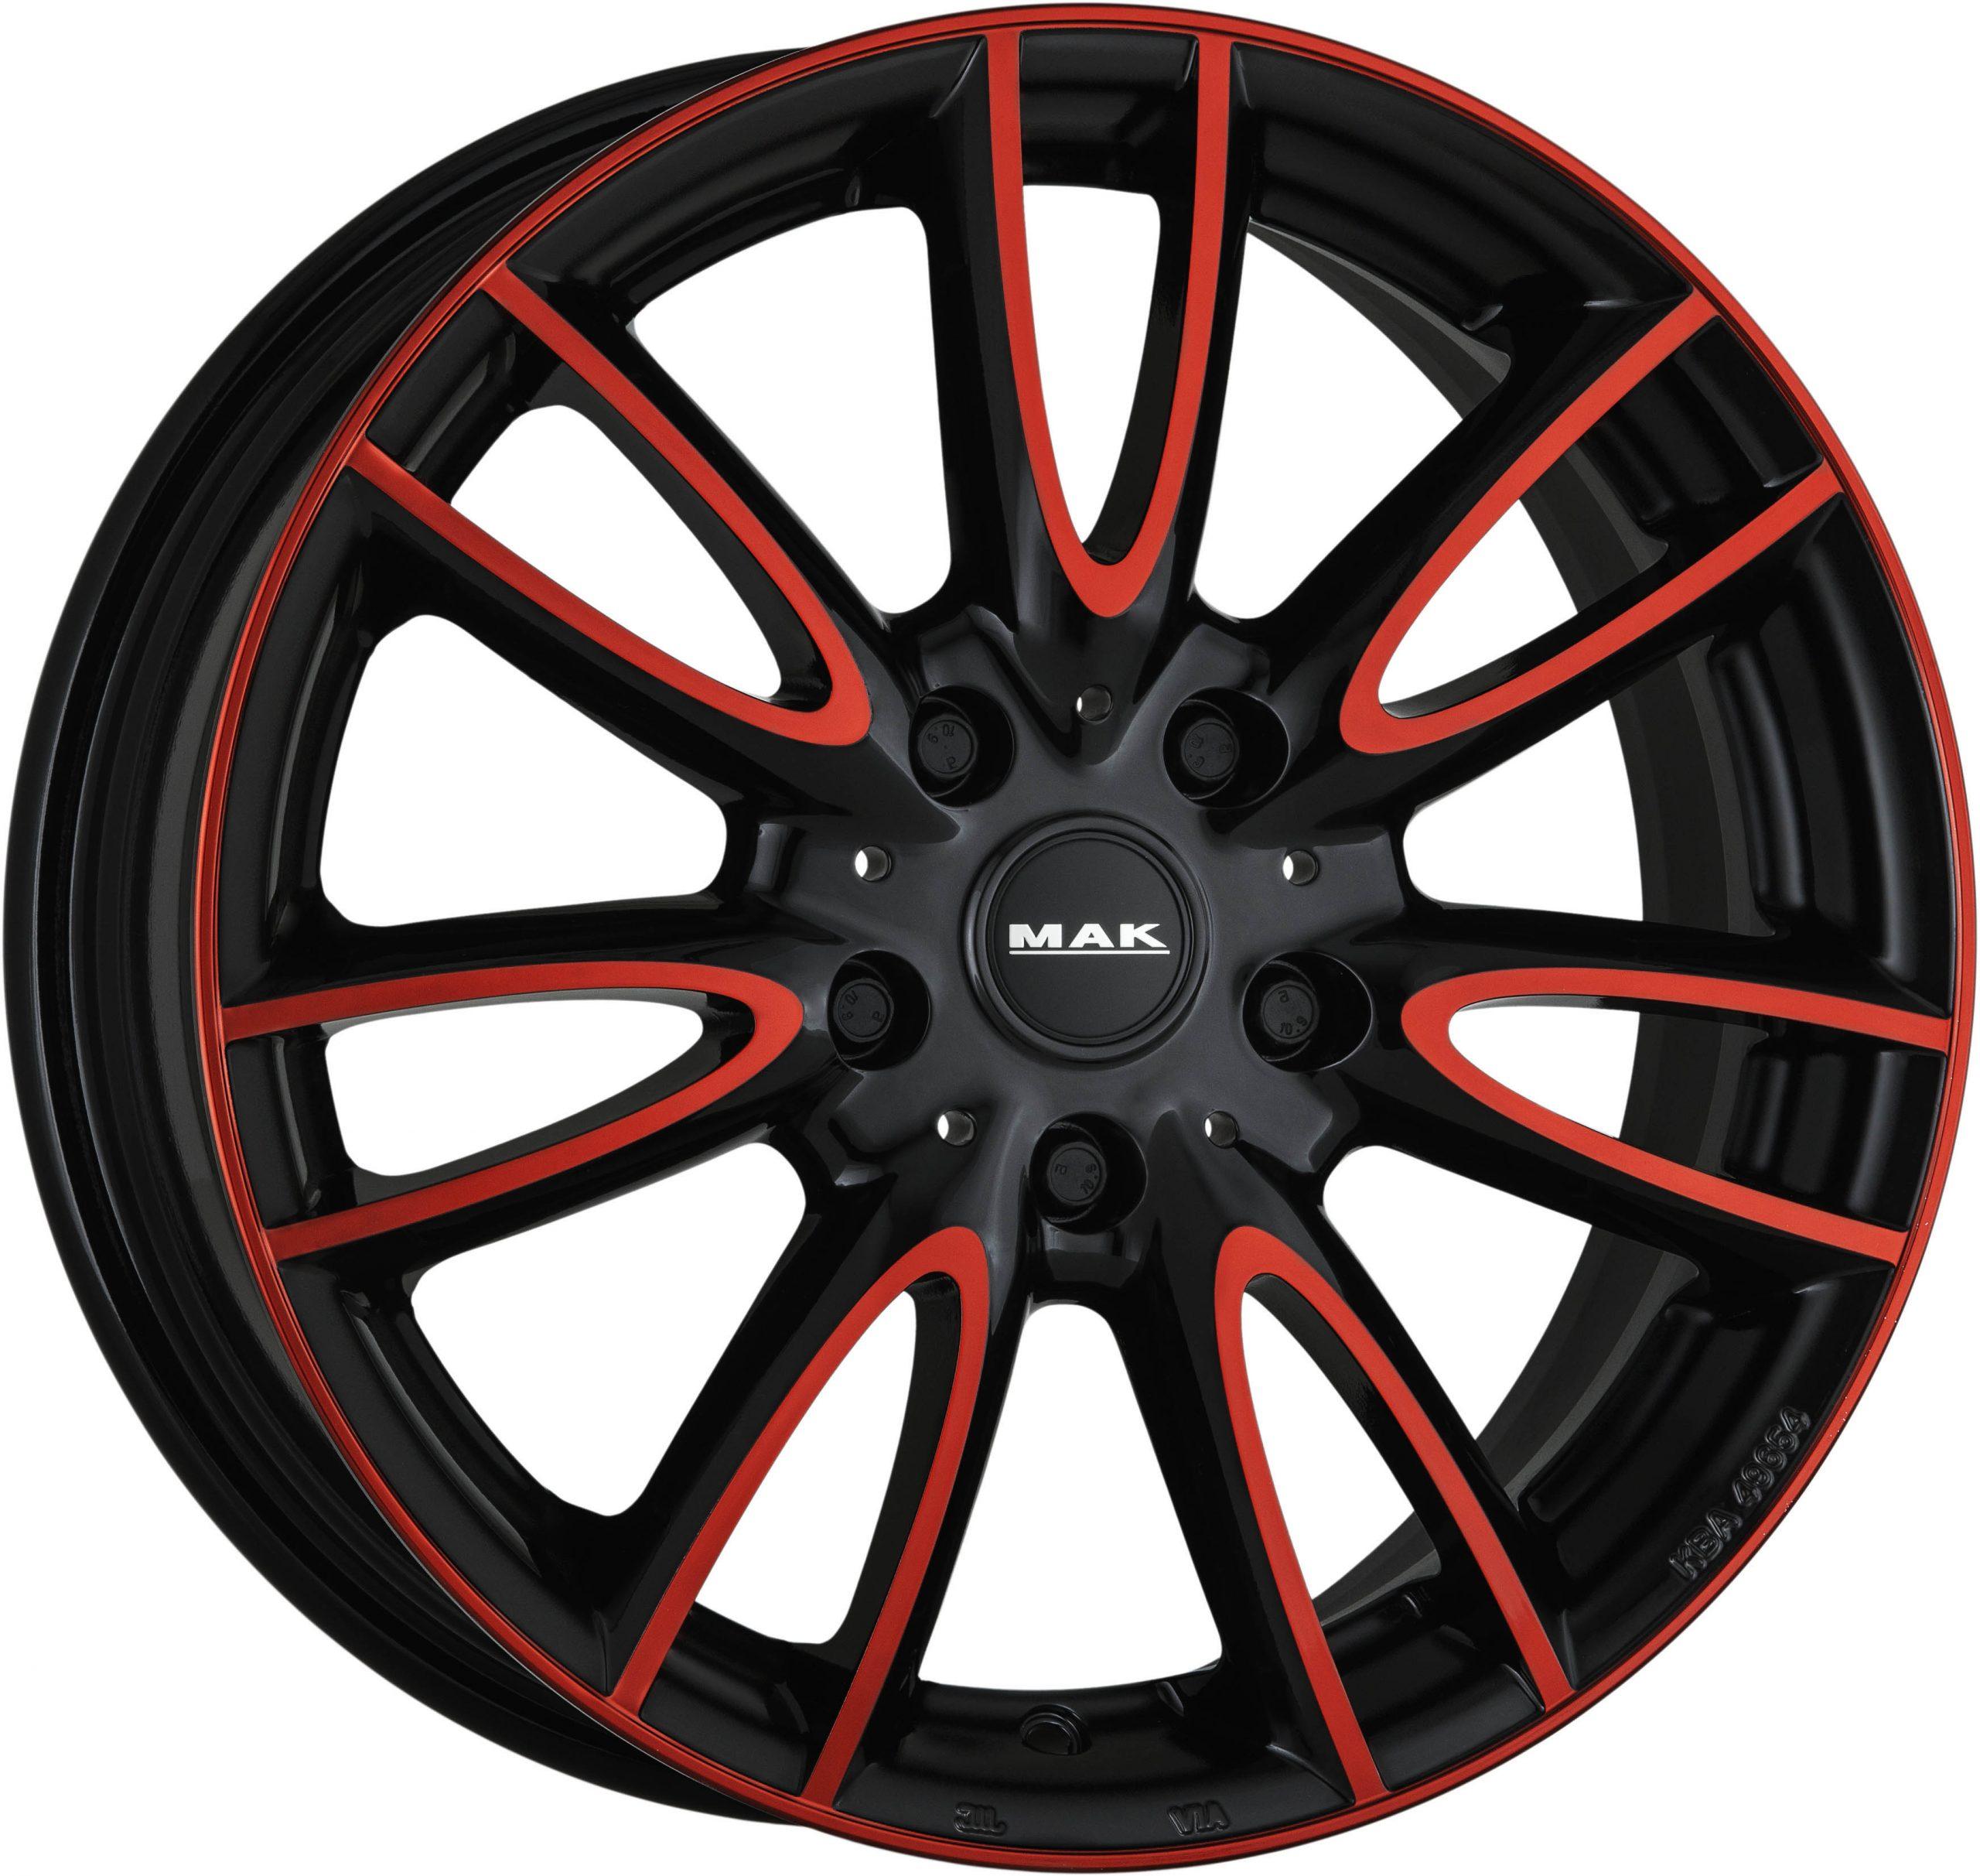 Mak Jackie W Anod Red Black Wheelwright Alloy Wheels Steel Wheels Tyres Tpms Wholesale